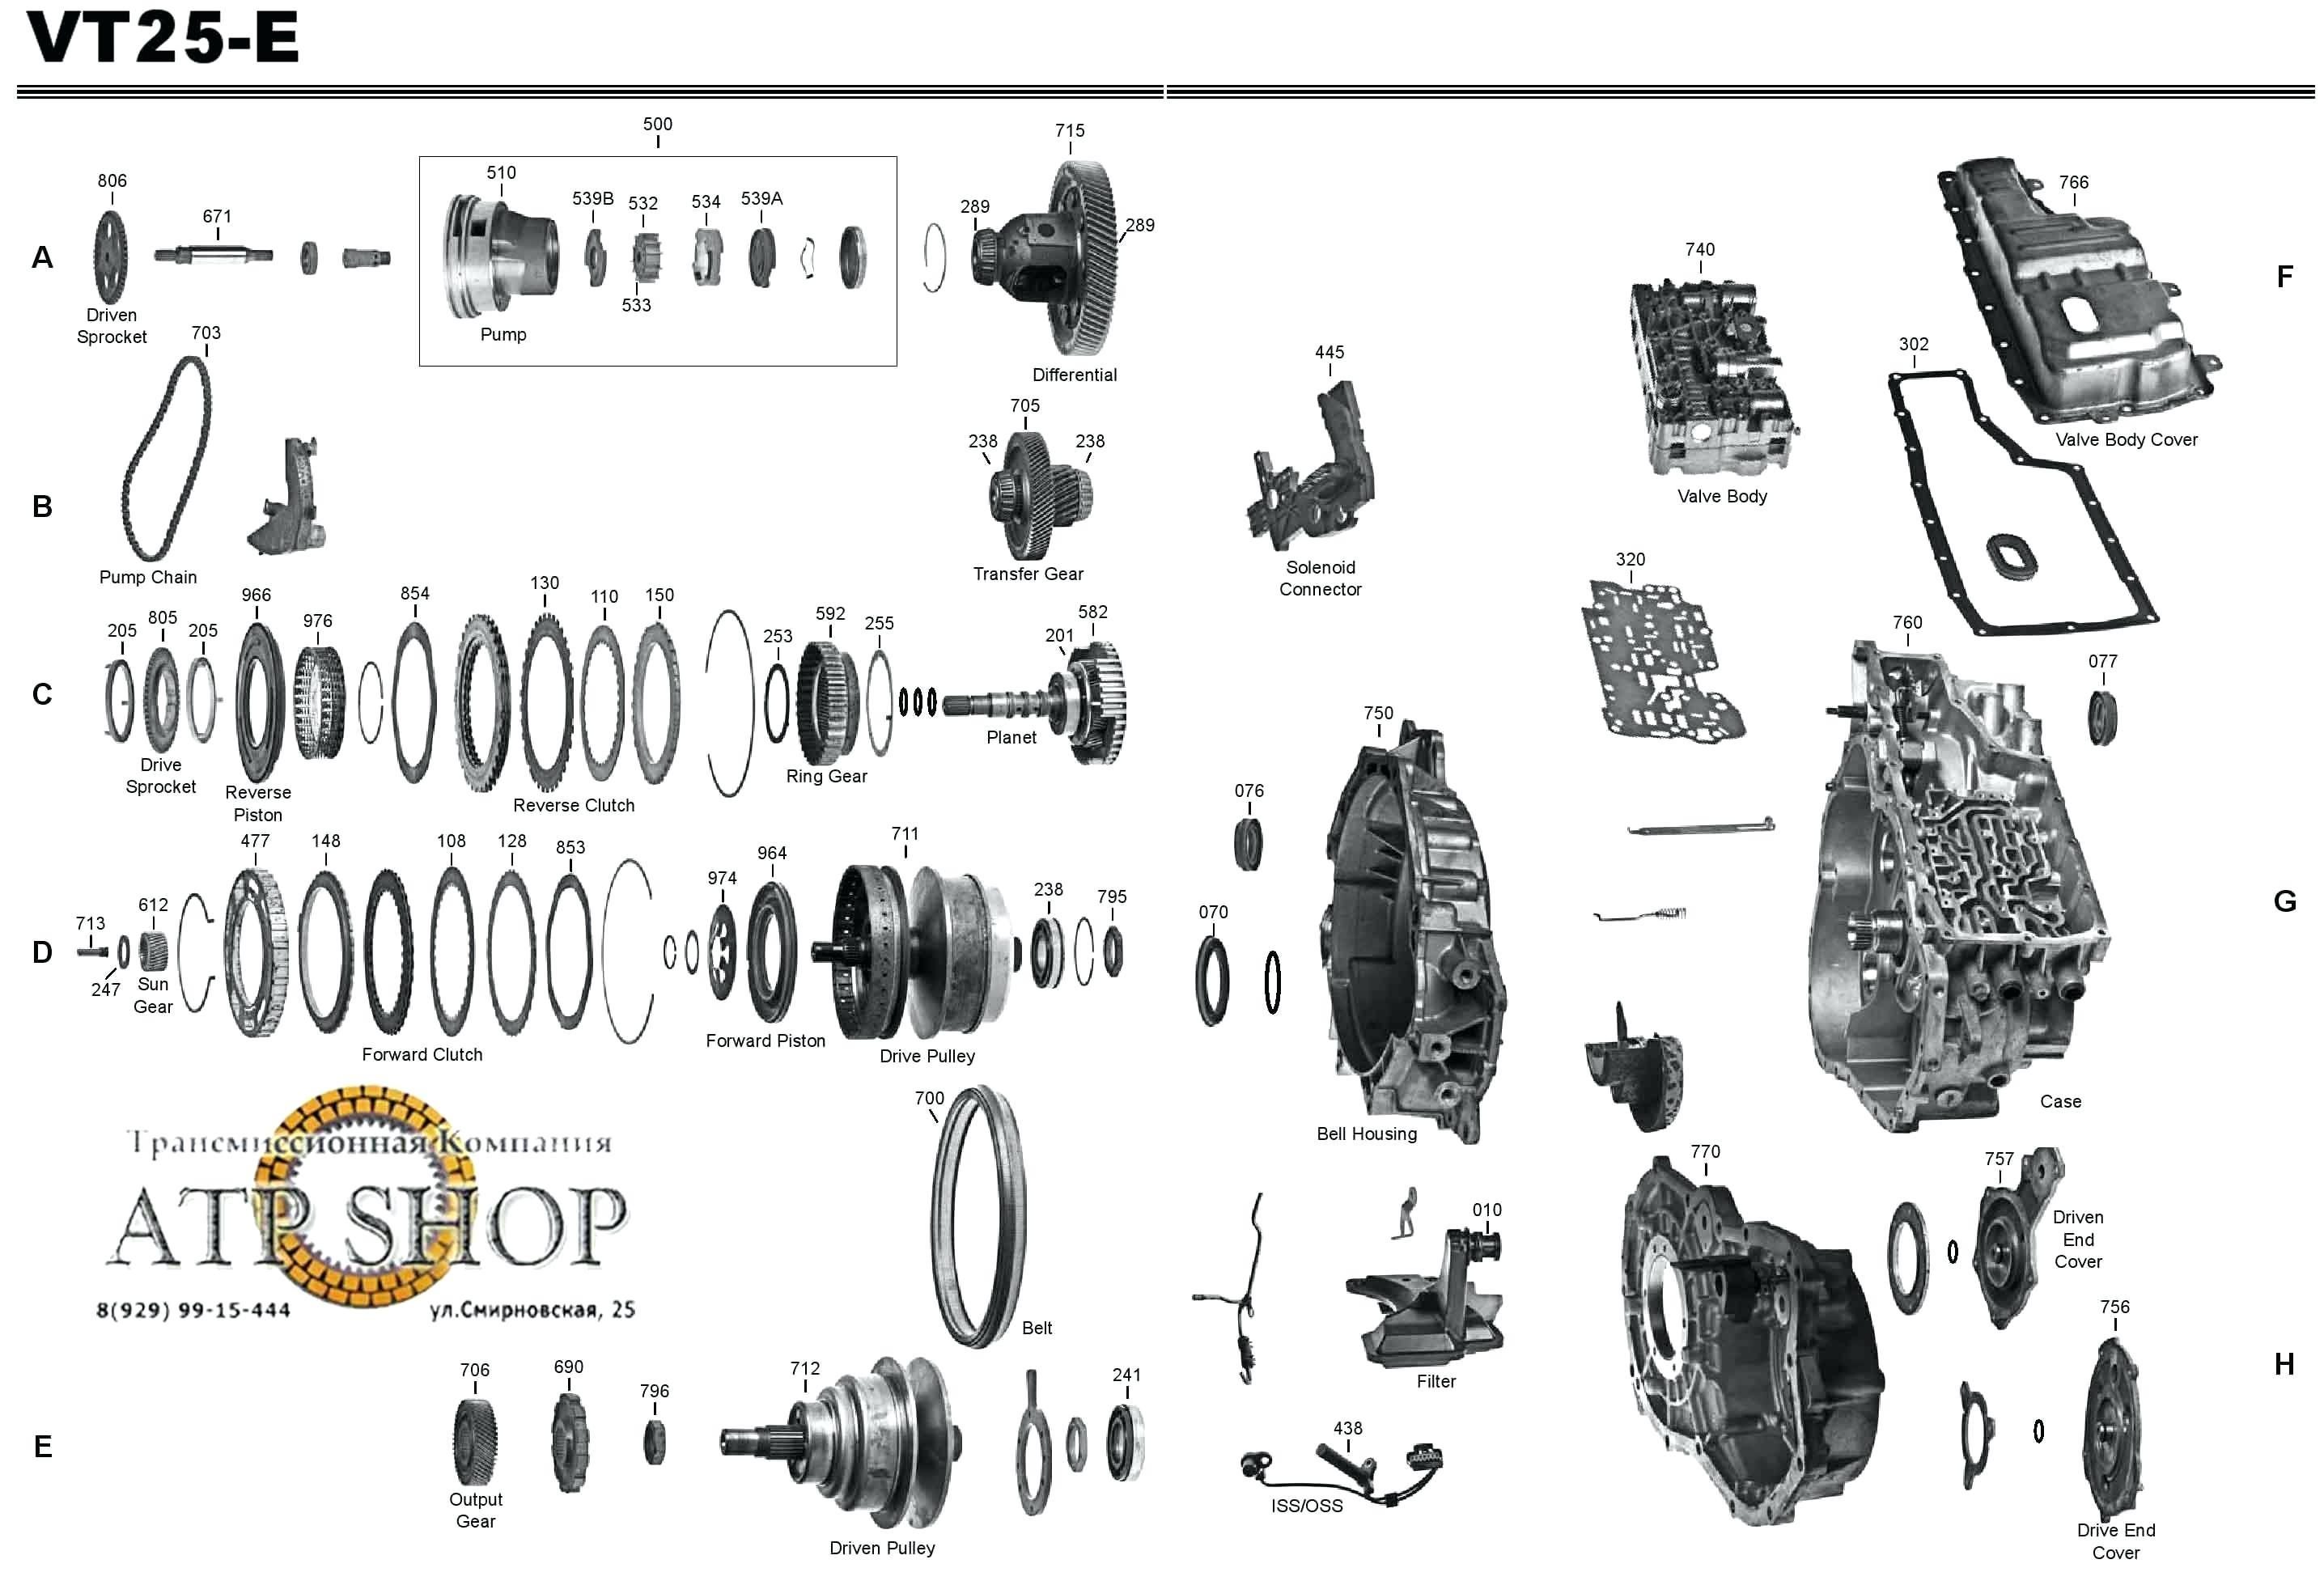 Saturn Engine Diagram 1994 2 Ecotec 2004 Related Post